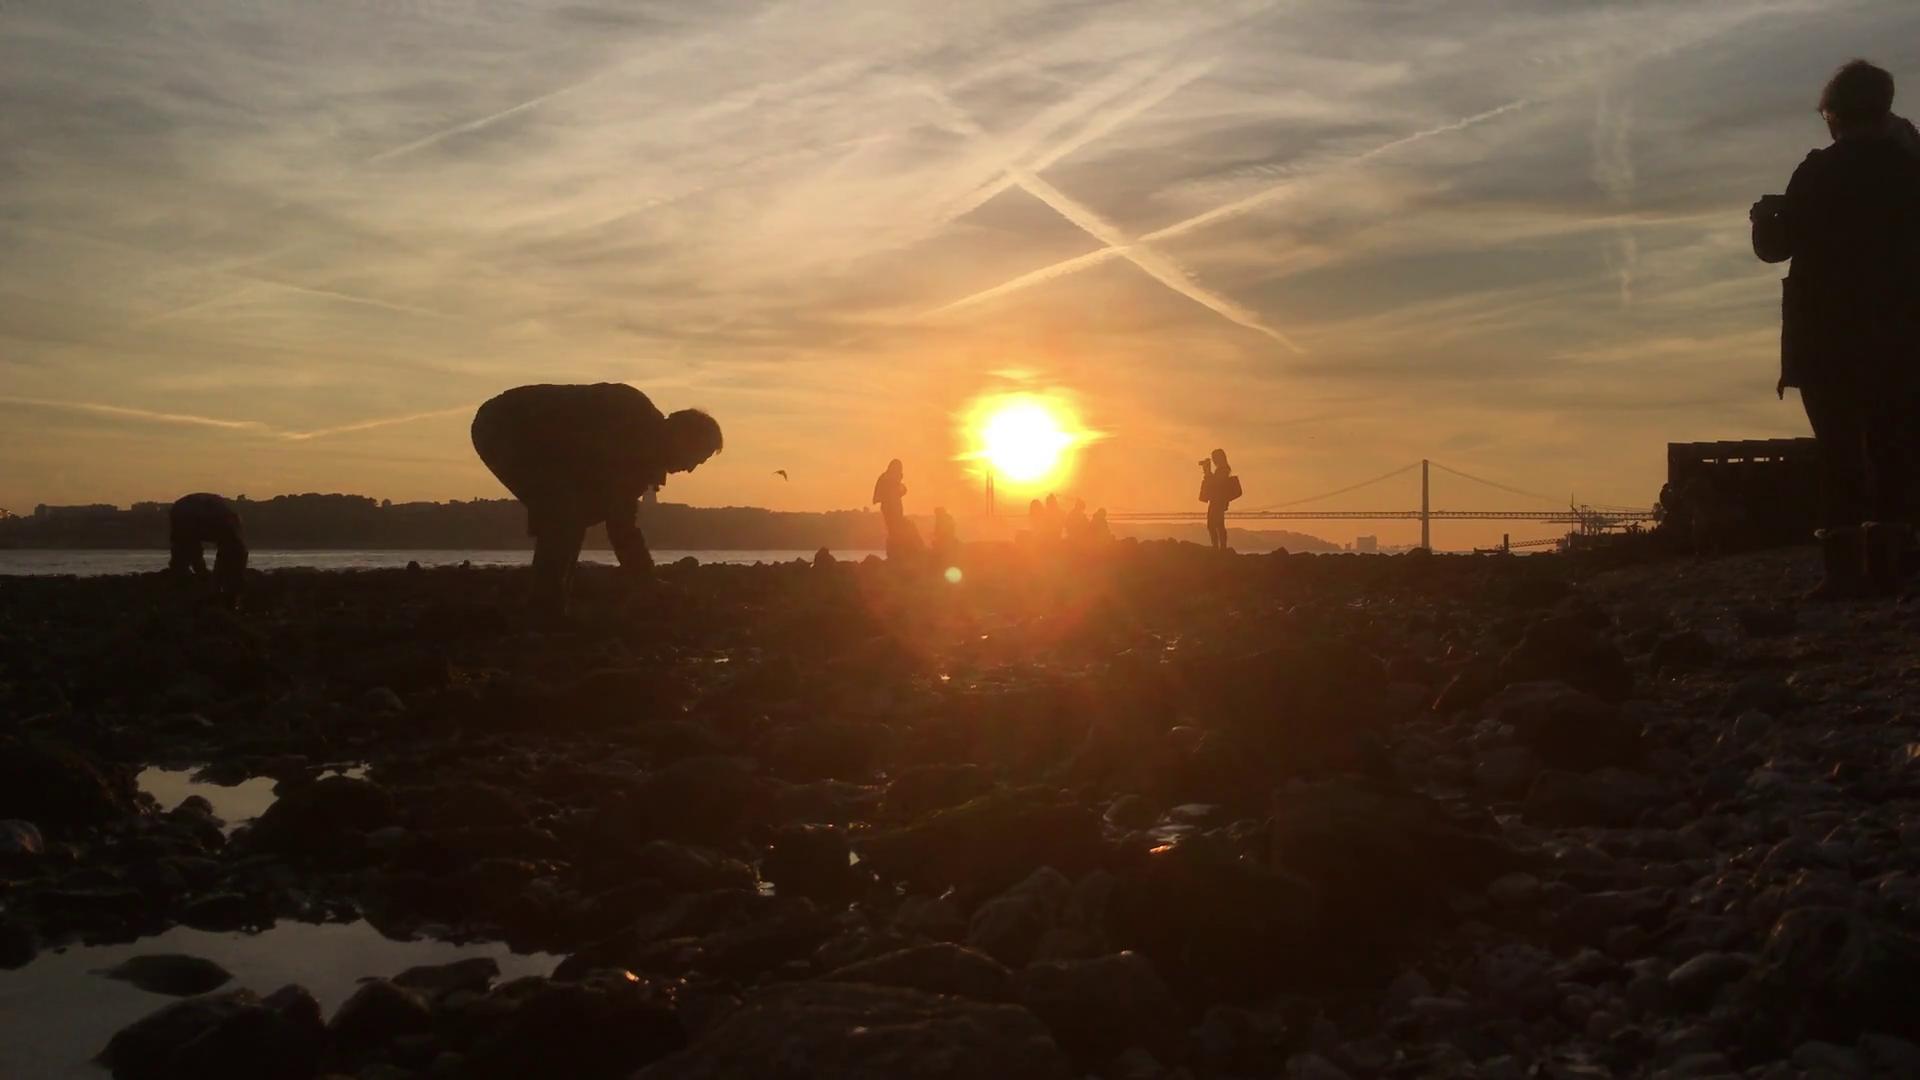 Sunset fun photo